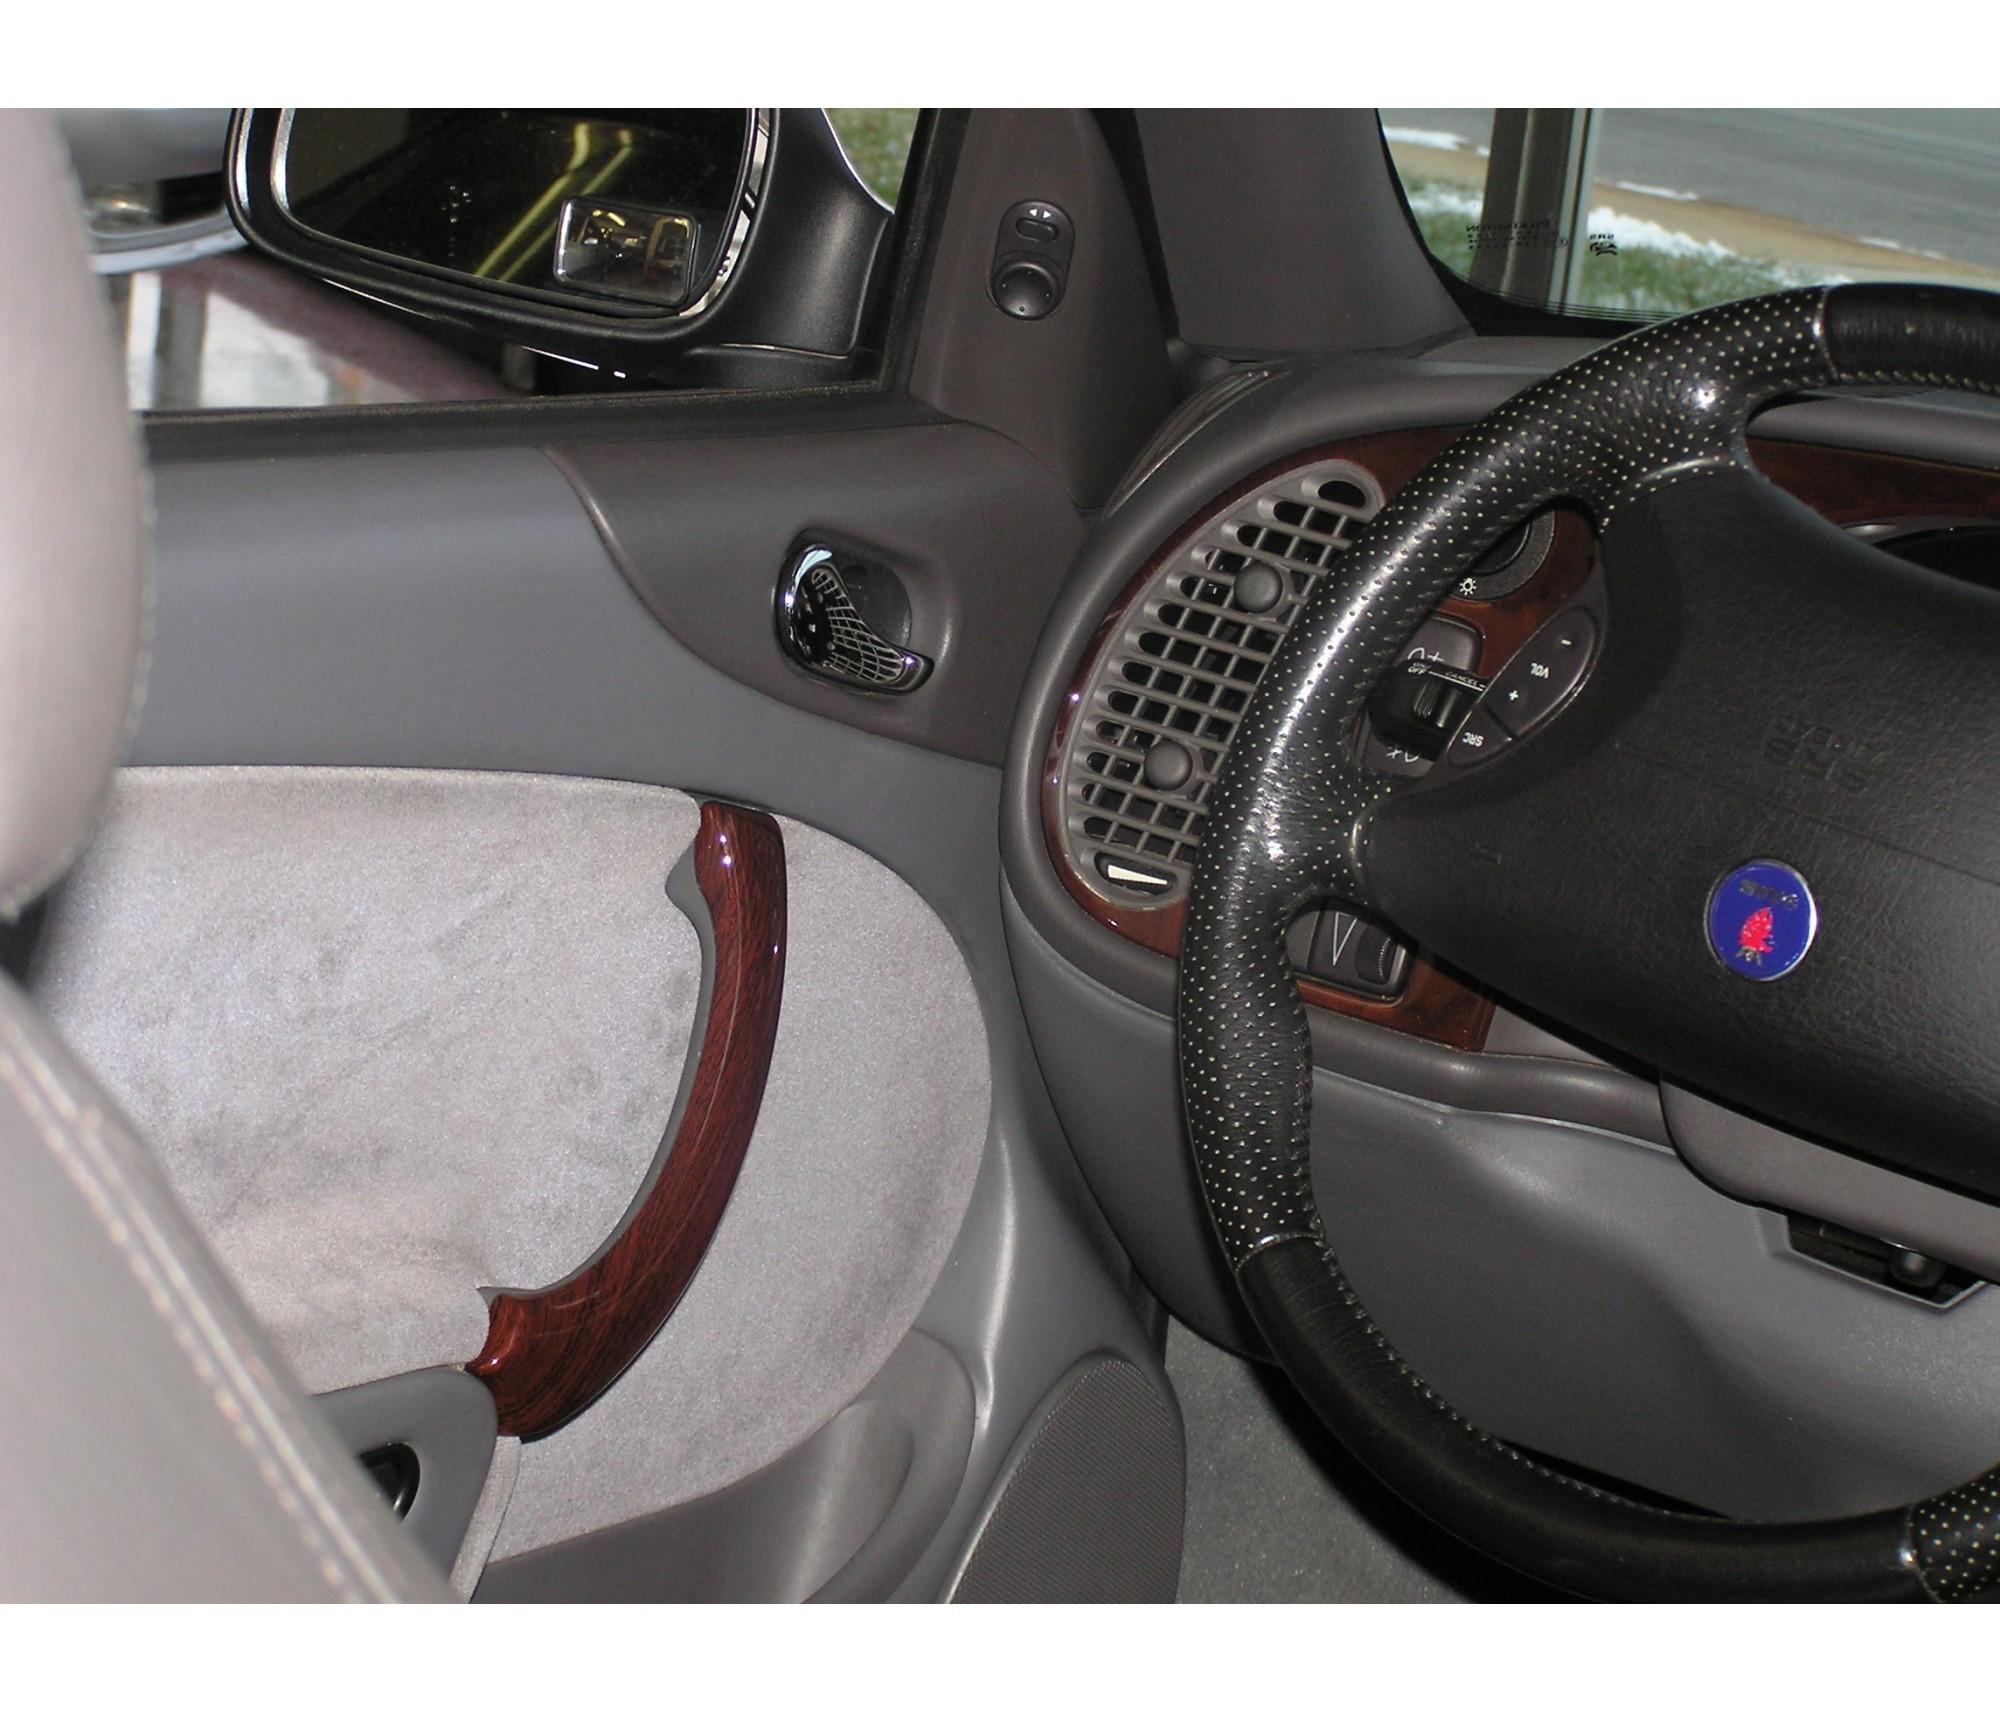 Stateofnine Custom Reproduction Wooden Saab Door Pulls